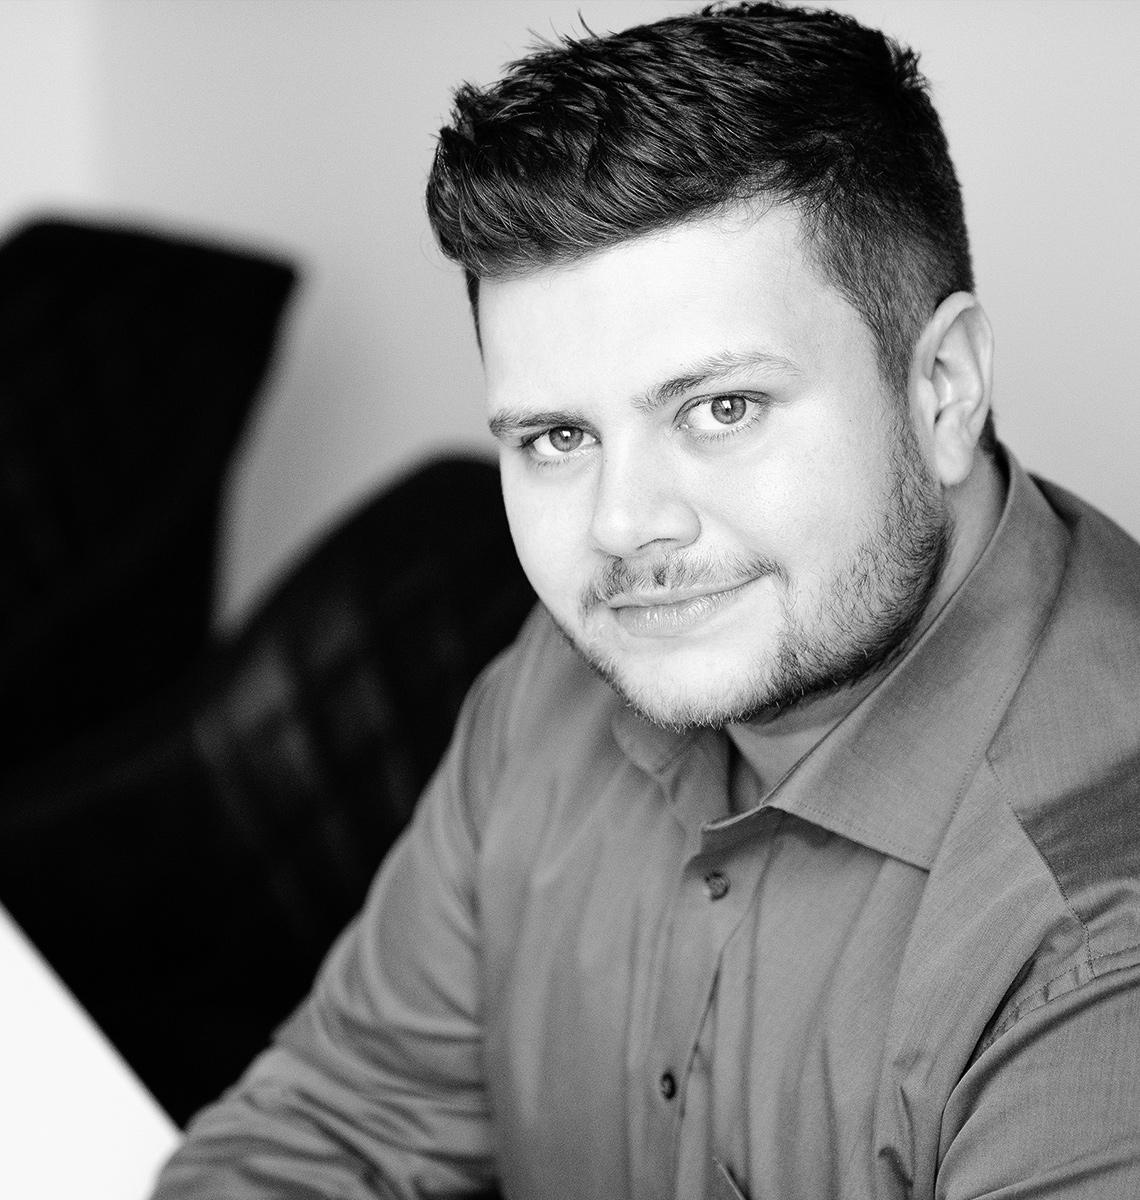 Portrait des Conversory Mitarbeiters Vincent Kielnhofer